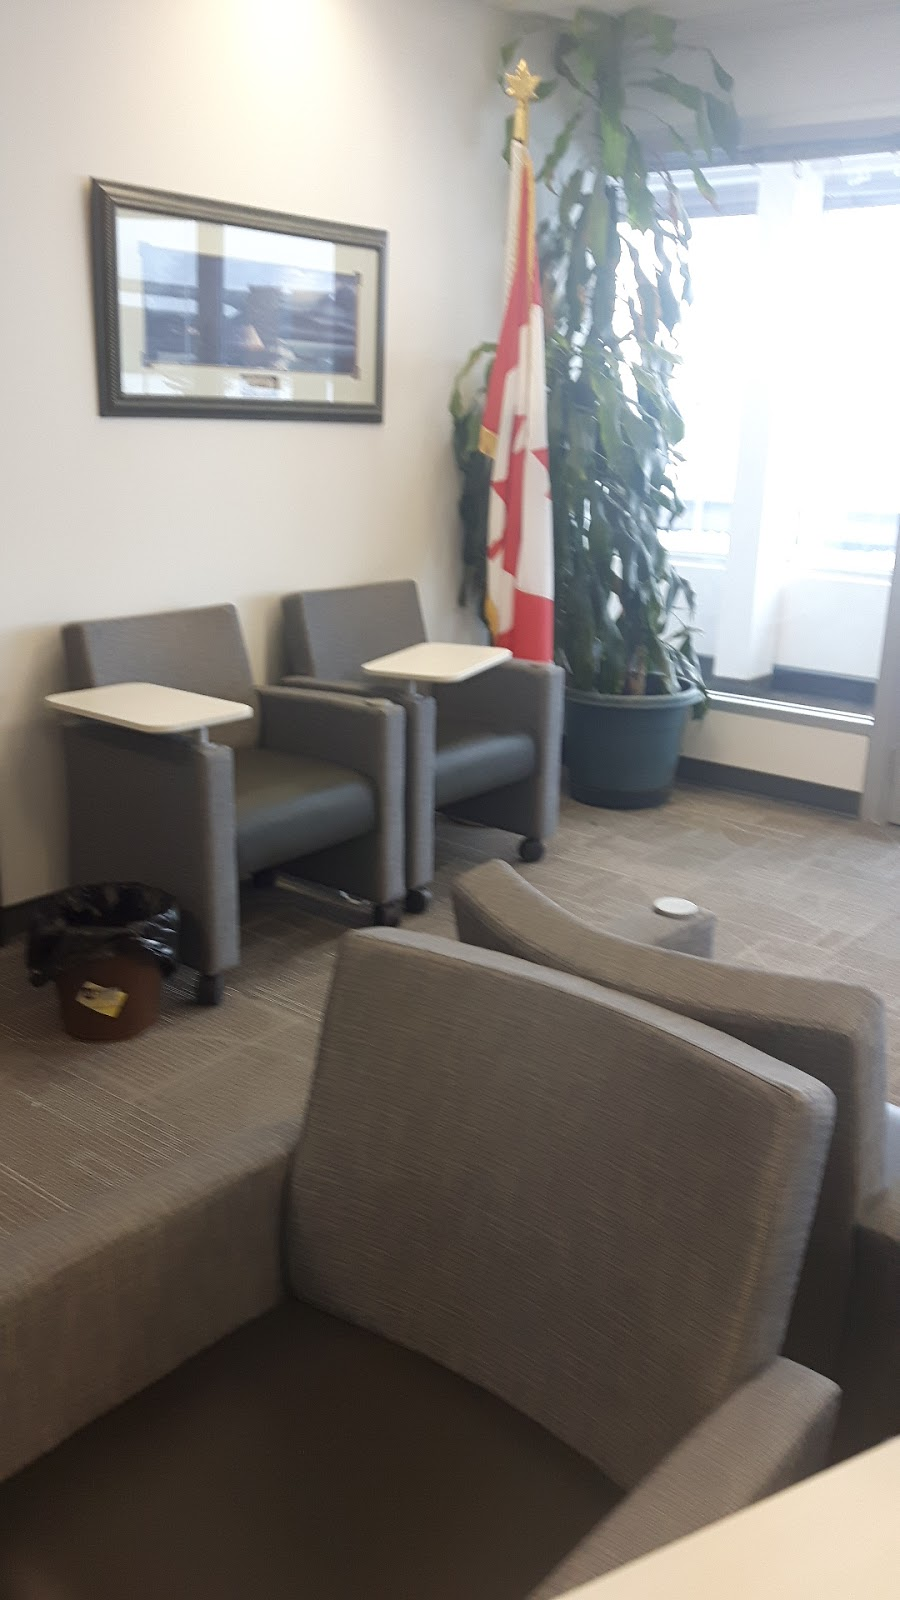 Tsuu TIna Administration Office | lodging | 9911 Chiila Boulevard, Tsuu T'ina Nation, AB T2W 6H6, Canada | 4032814455 OR +1 403-281-4455